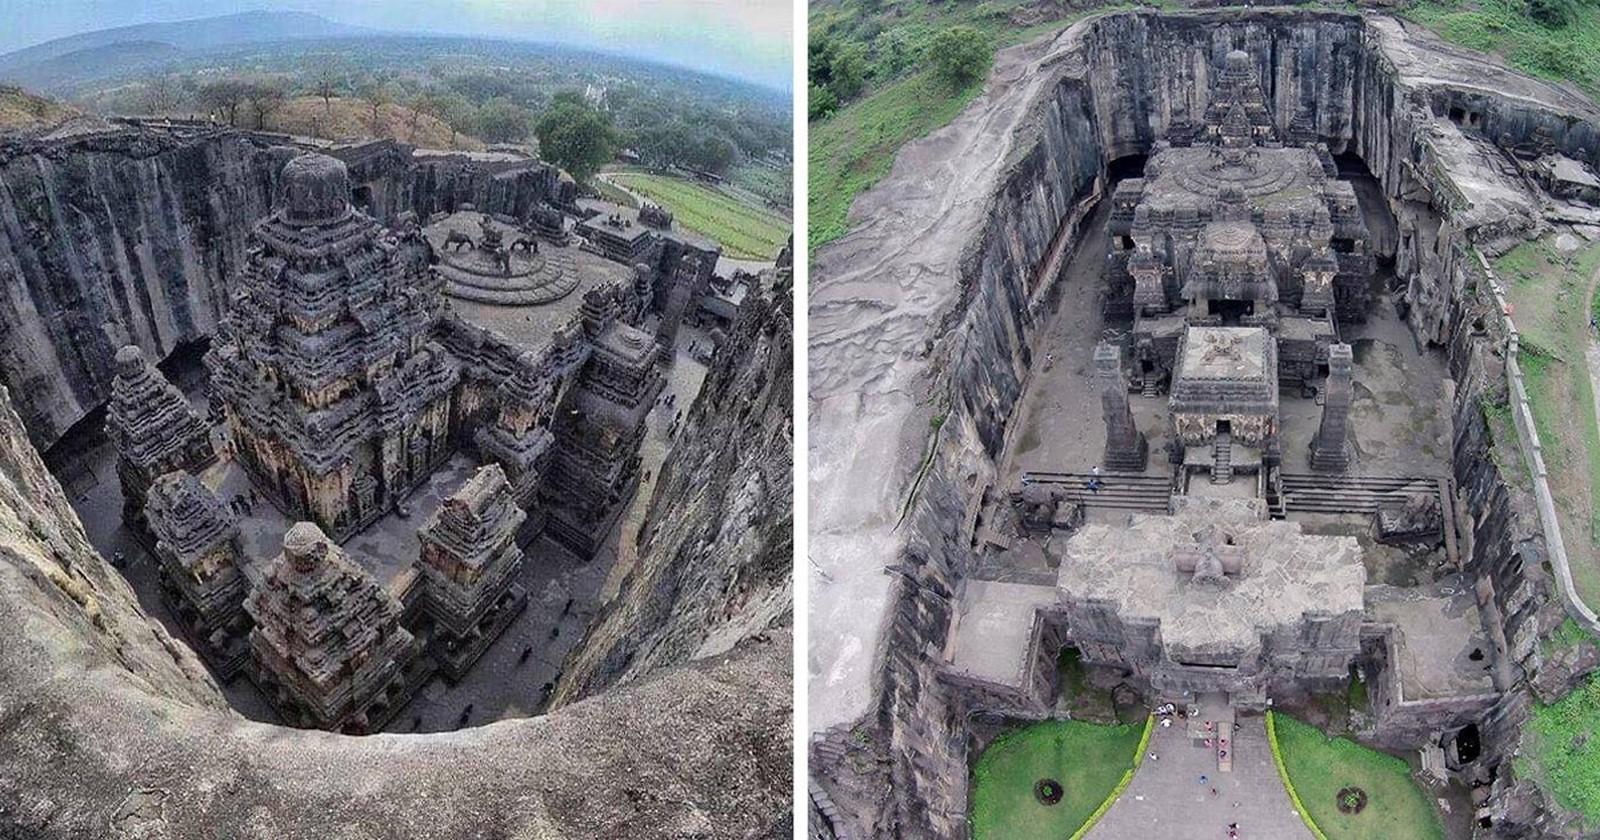 Architectural heritage of Maharashtra - Sheet11